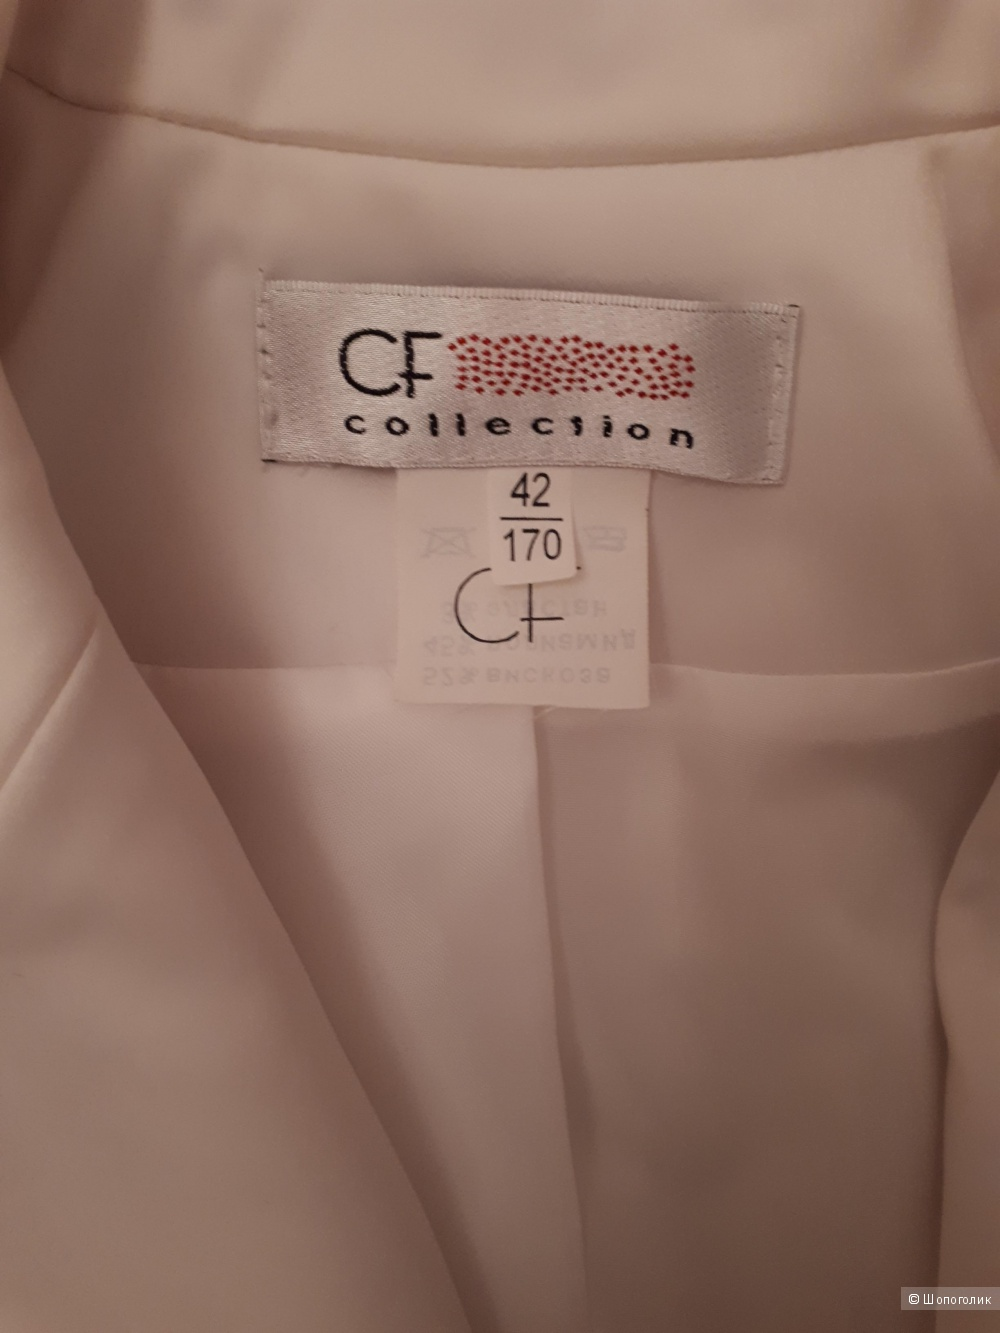 Жакет, CF-collection, 42 размер